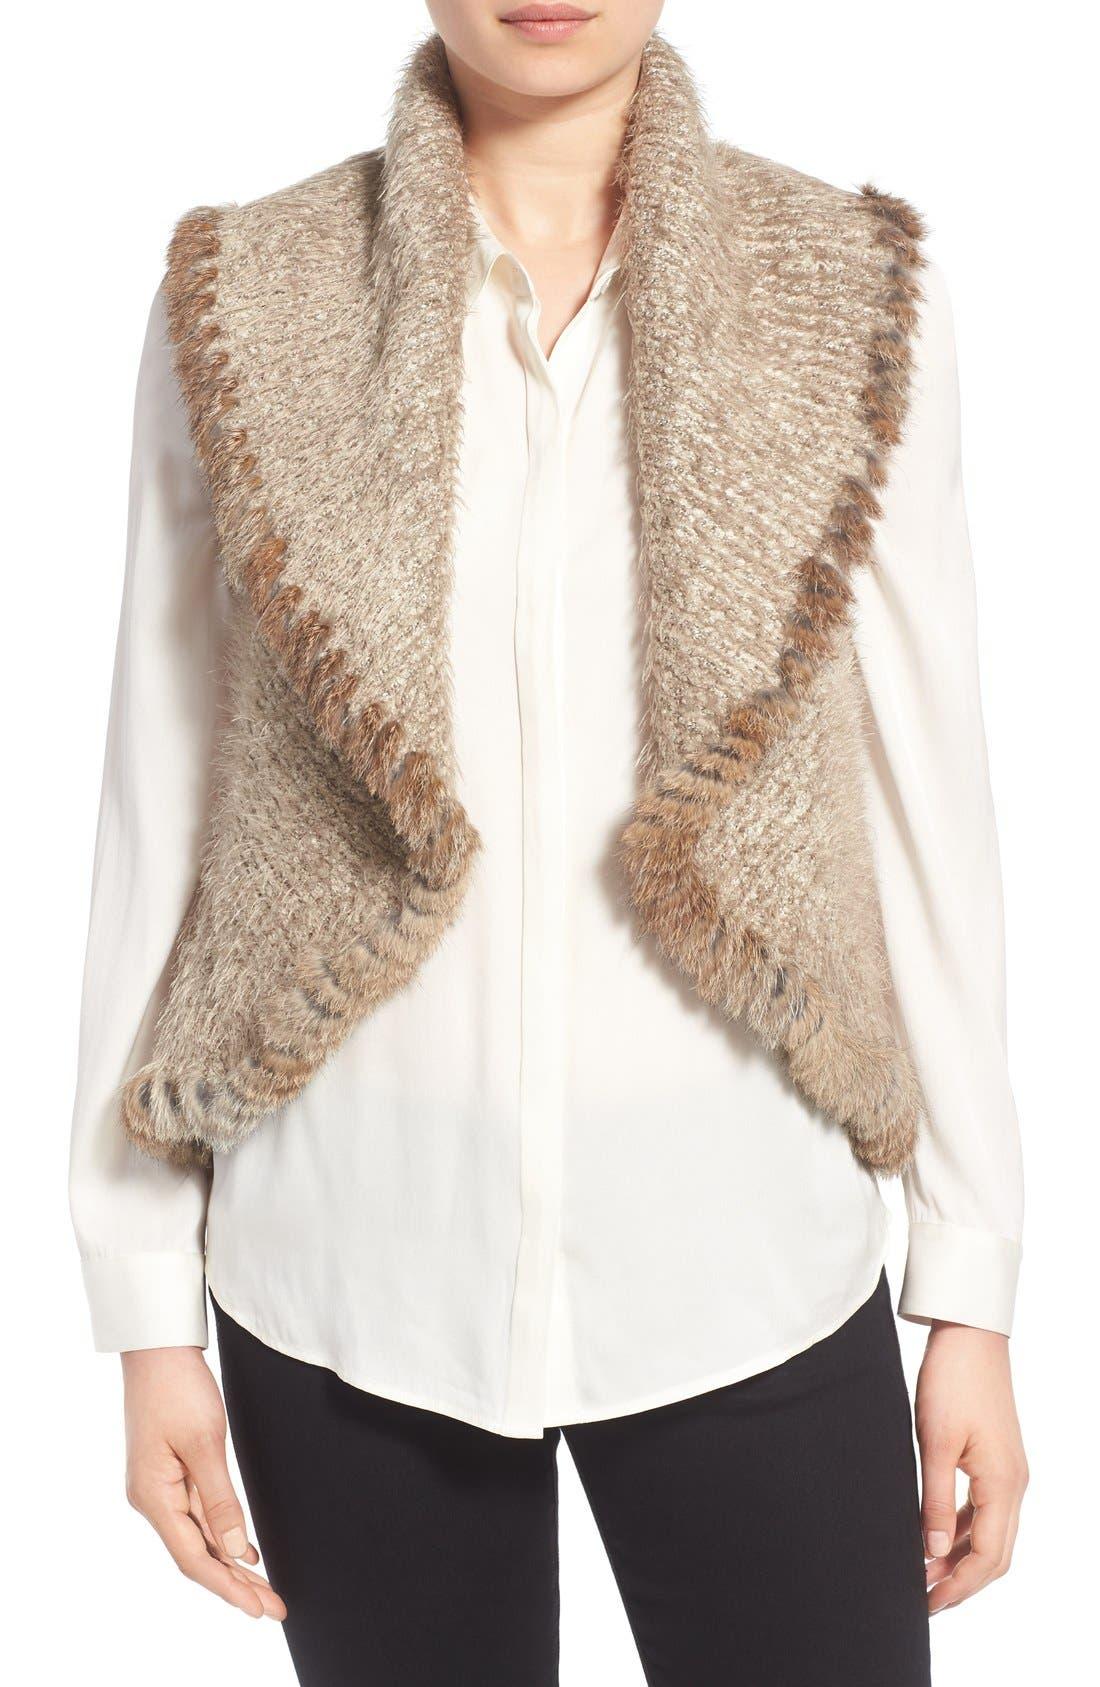 Main Image - Love Token Knit Vest with Genuine Rabbit Fur Trim